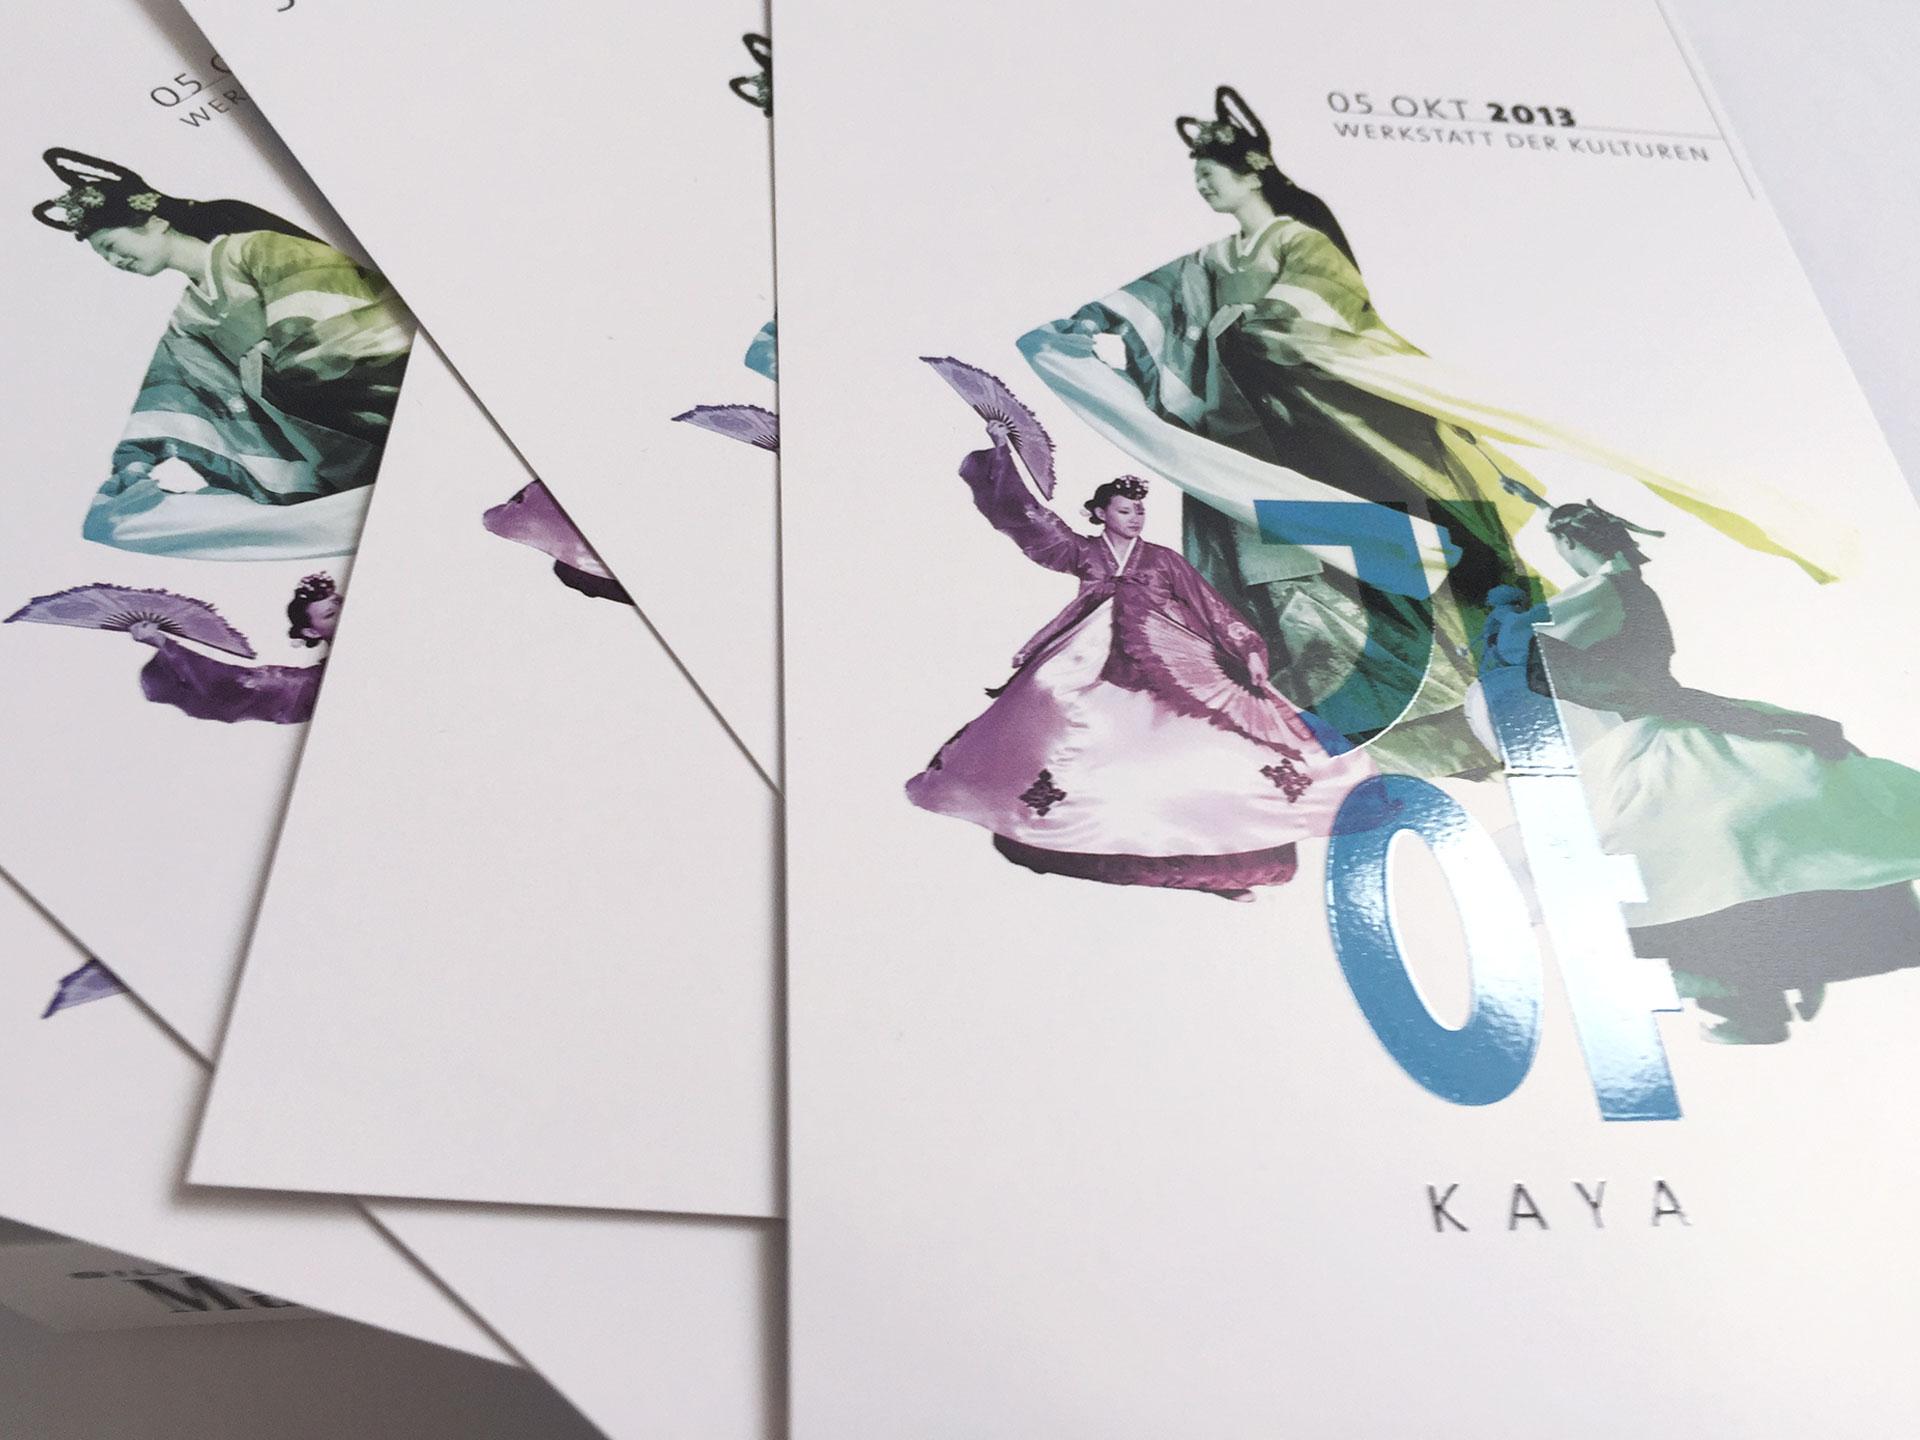 Kaya 30 Jahre